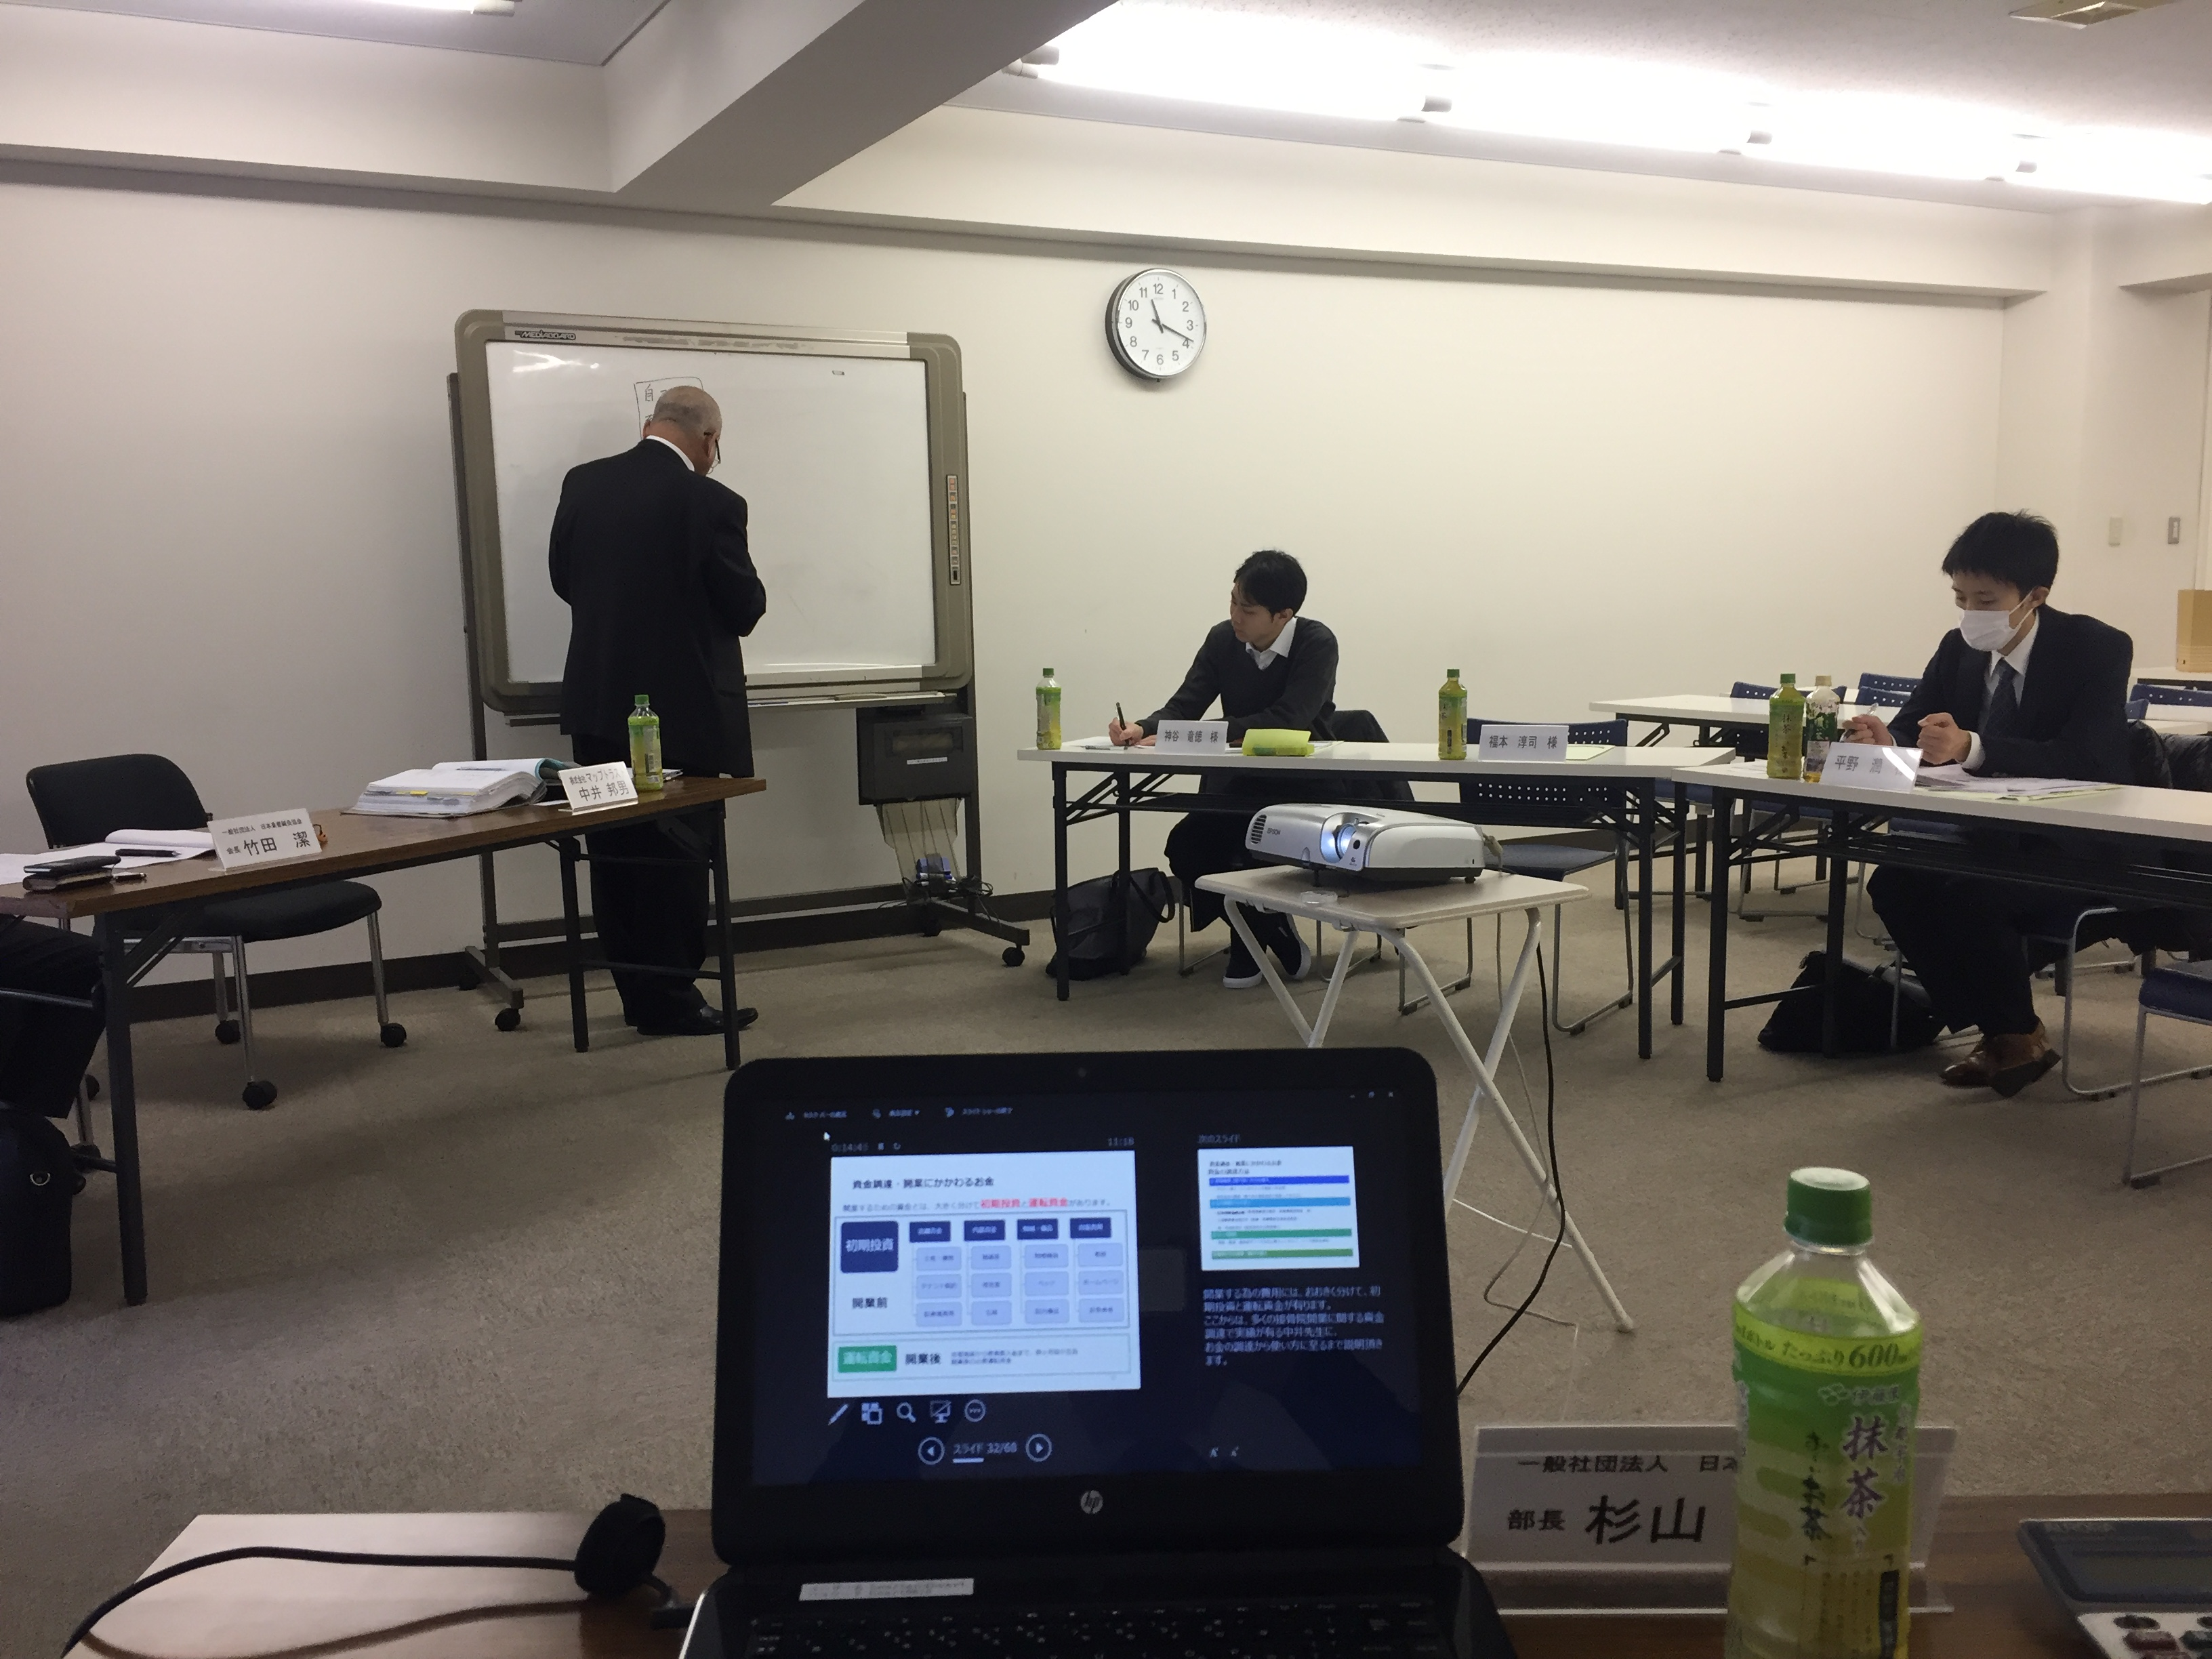 接骨院・整骨院 開業セミナー in名古屋 開催